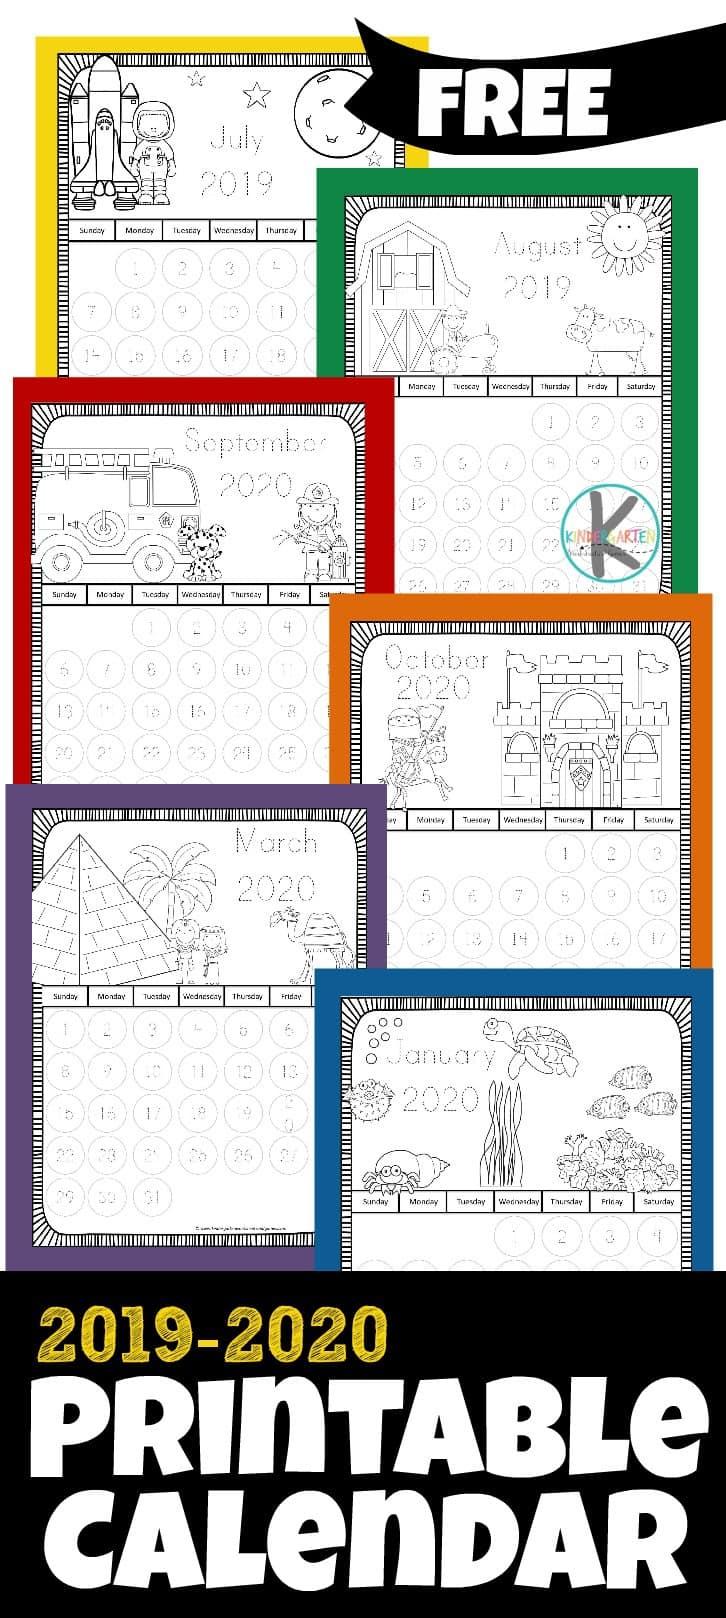 Free 2019-2020 Printable Calendar To Color – Kindergarten Worksheets in 2020 Free Printable Coloring Calendar